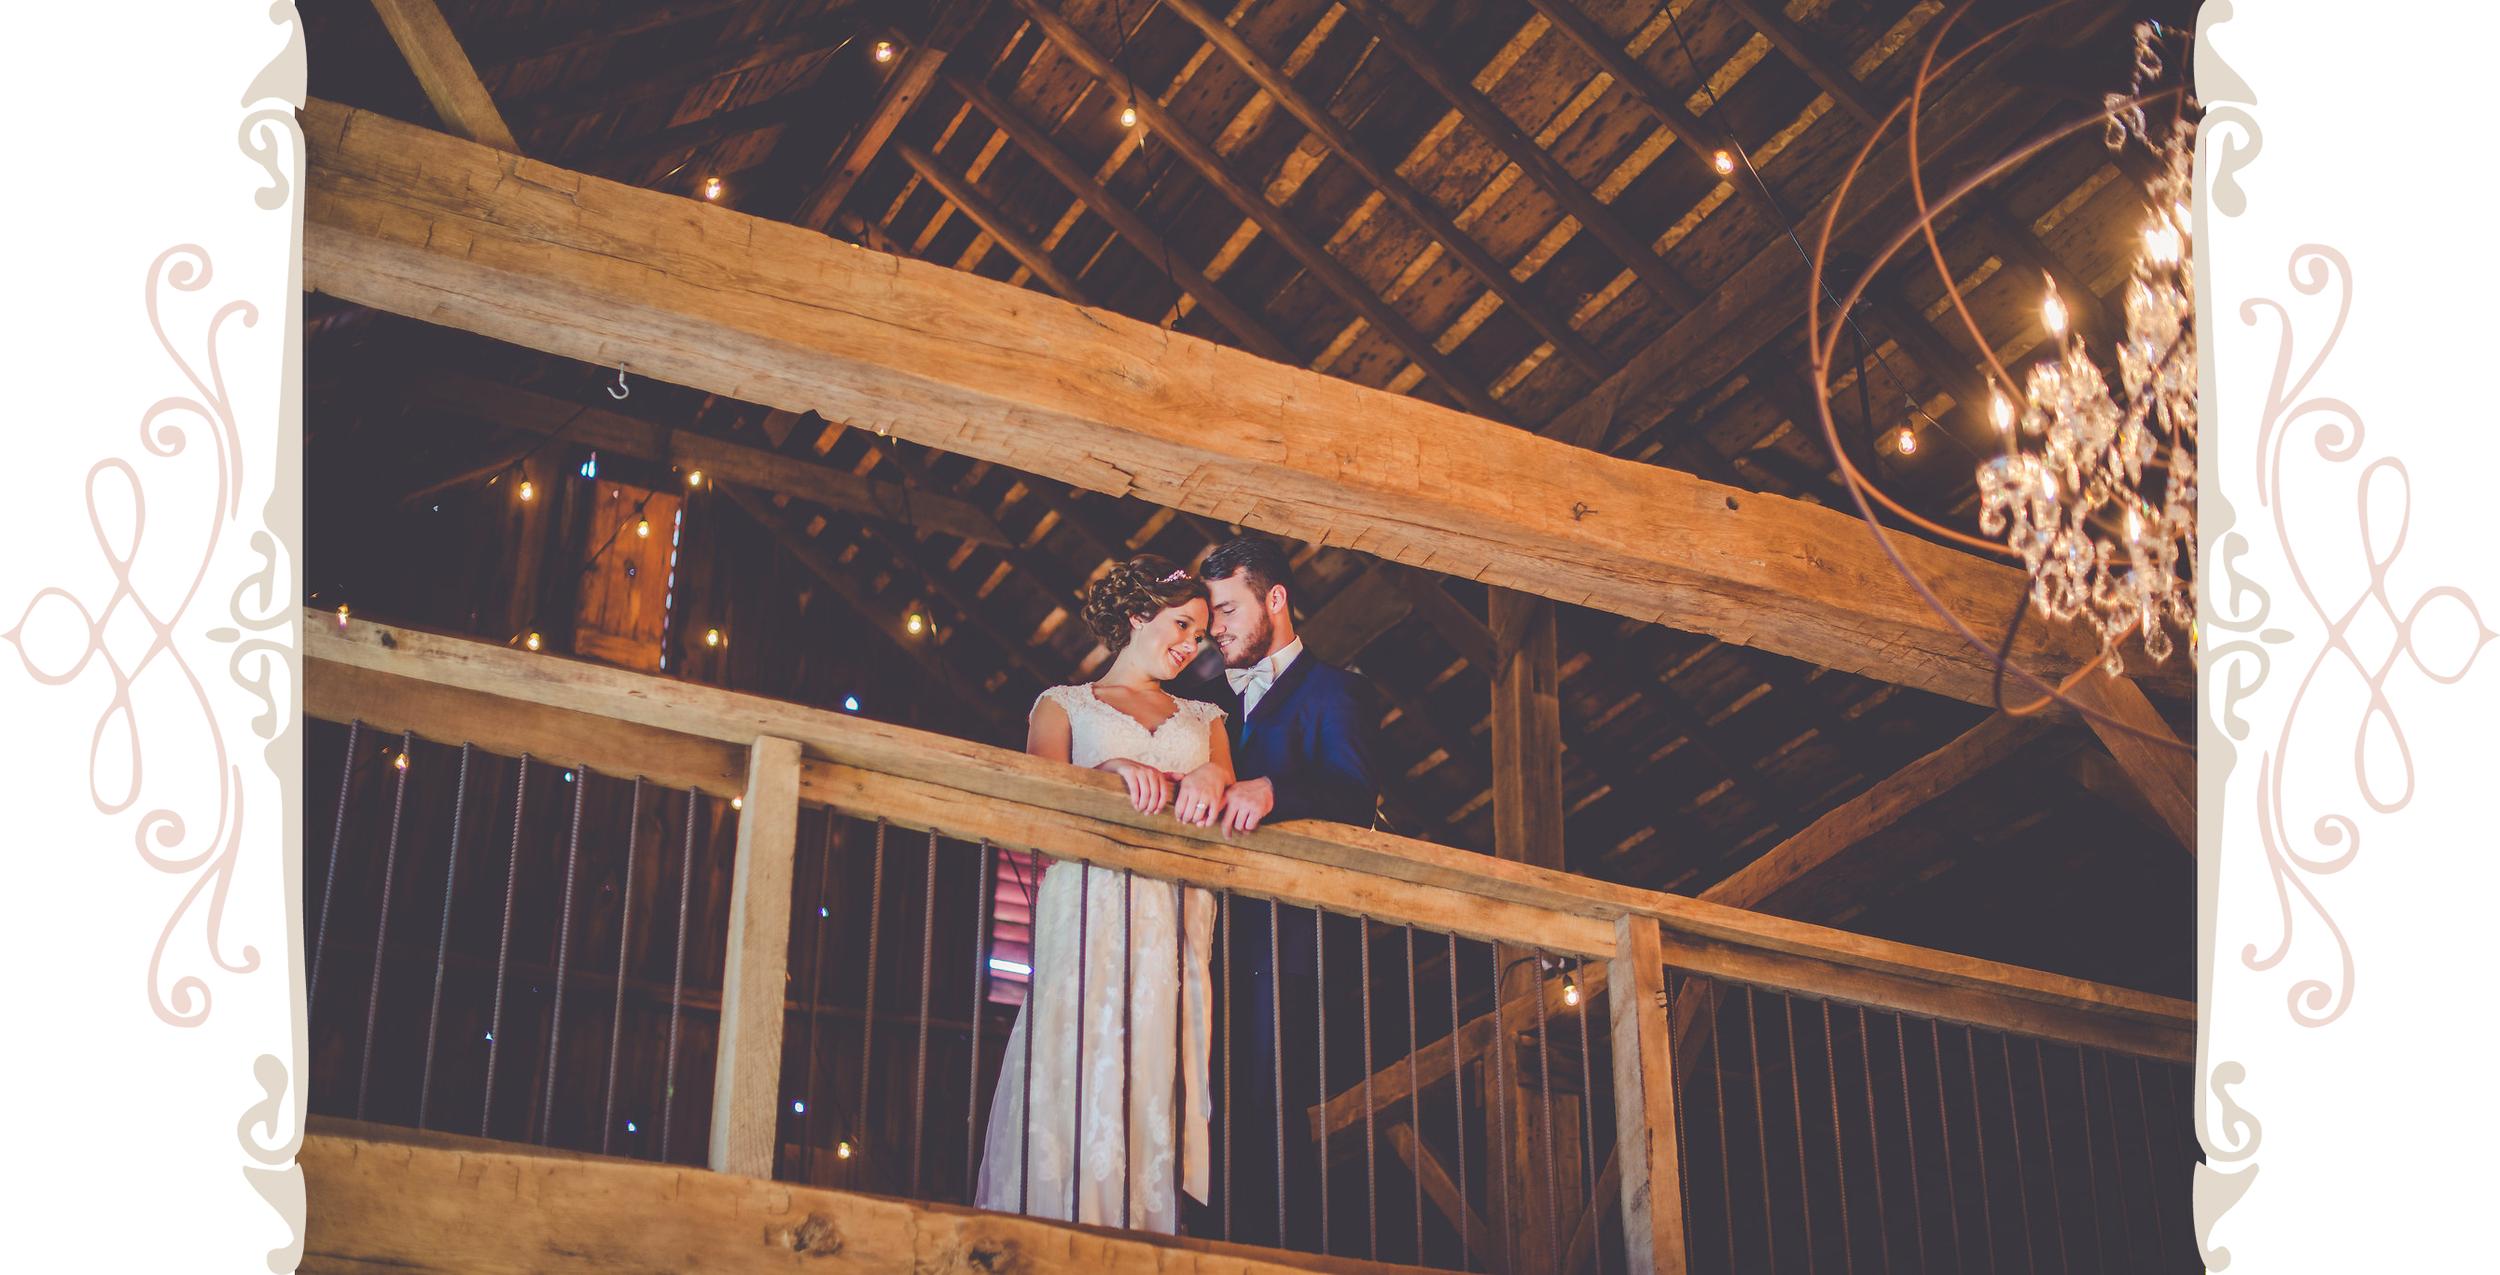 Husband & Wife | Vintage Oaks Banquet Barn | Delphi Indiana Event Venue